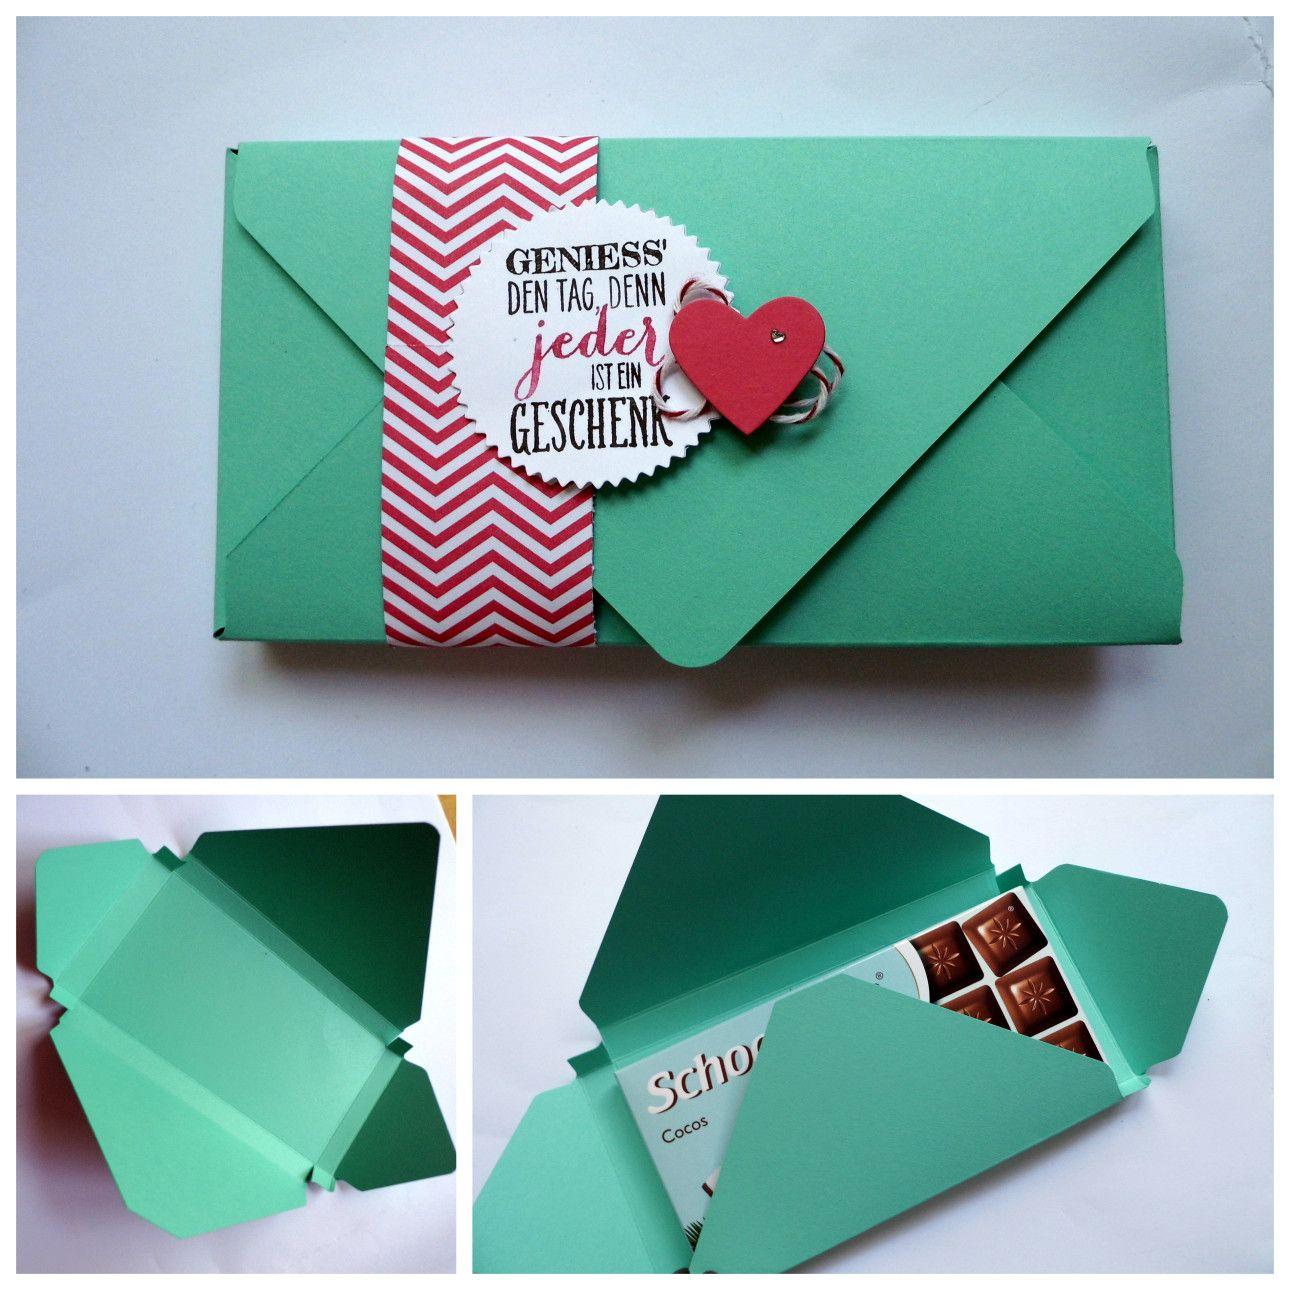 schokolade verpackung wimpeleien geschenke pinterest schokolade geschenk und geschenkideen. Black Bedroom Furniture Sets. Home Design Ideas